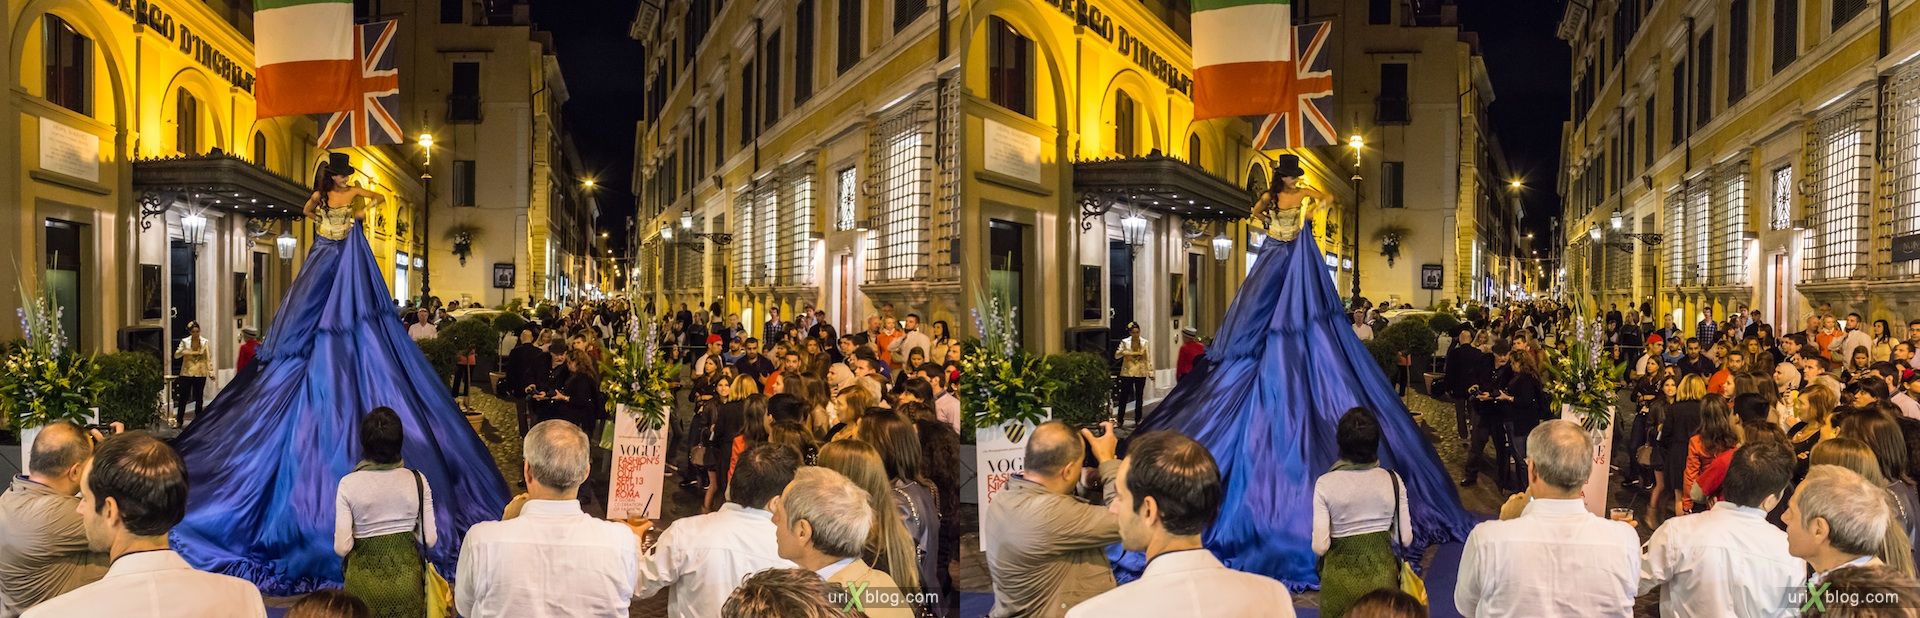 2012, Vogue Fashions Night Out, via Bocca di Leone street, via Borgognona street, crossroads, intersection, fastival, Rome, Italy, Europe, 3D, stereo pair, cross-eyed, crossview, cross view stereo pair